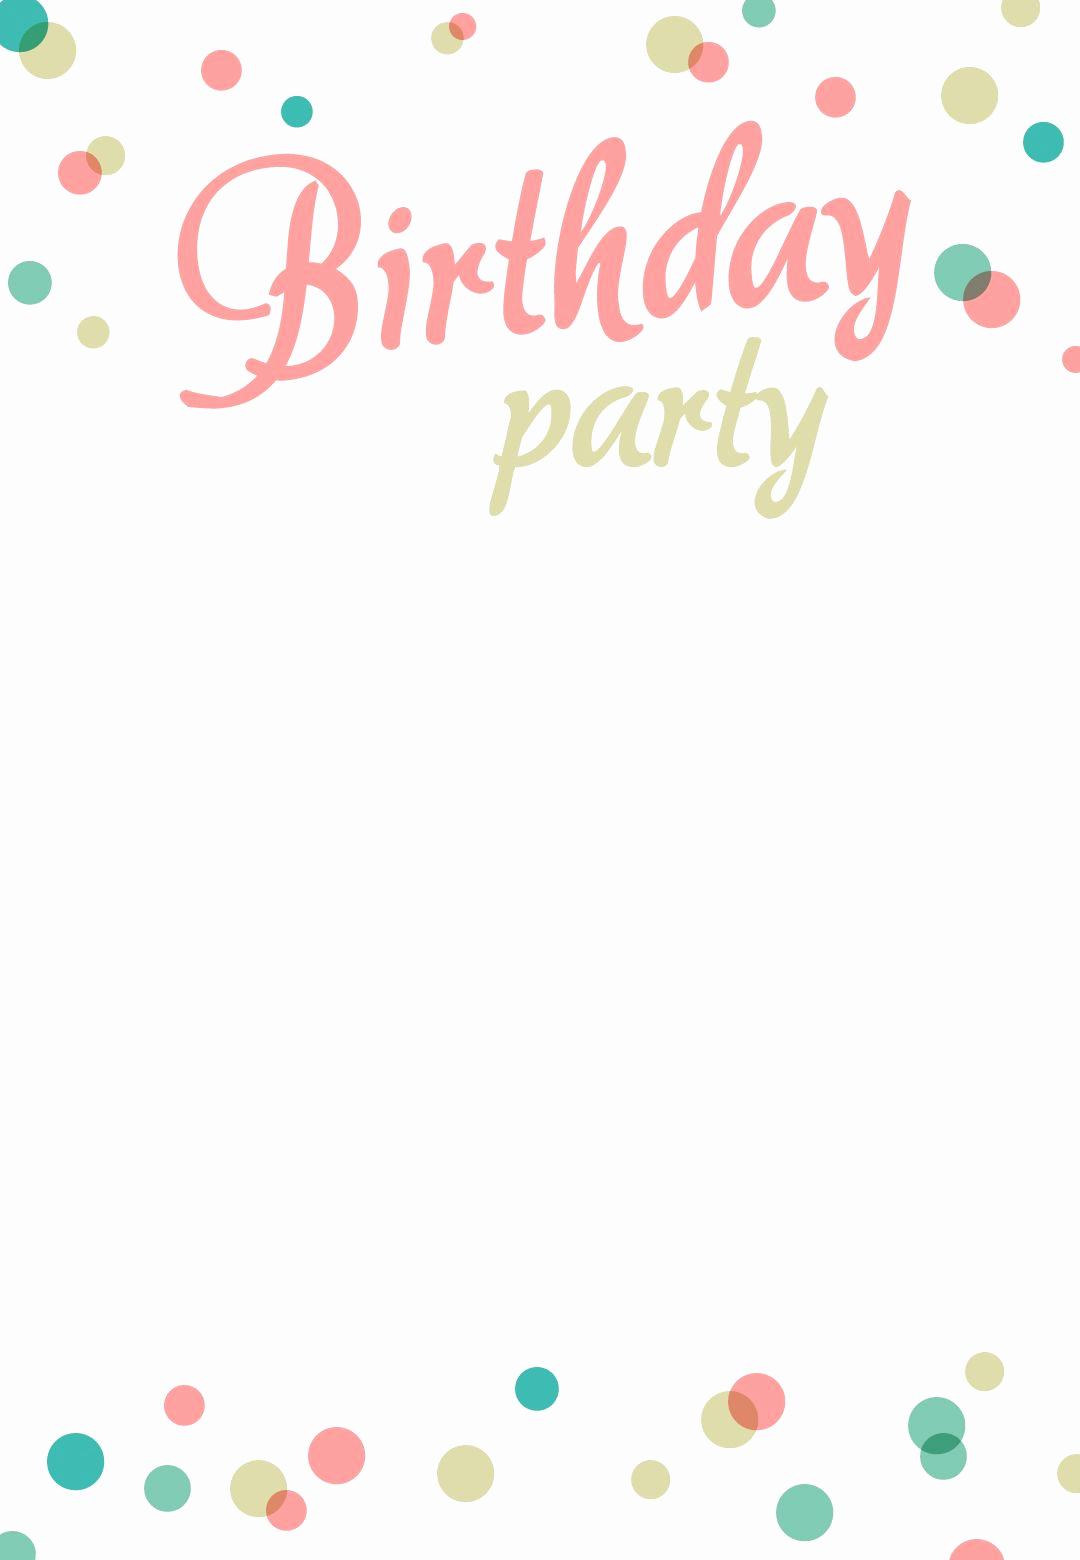 Art Party Invitation Template Unique Birthday Party Invitation Free Printable